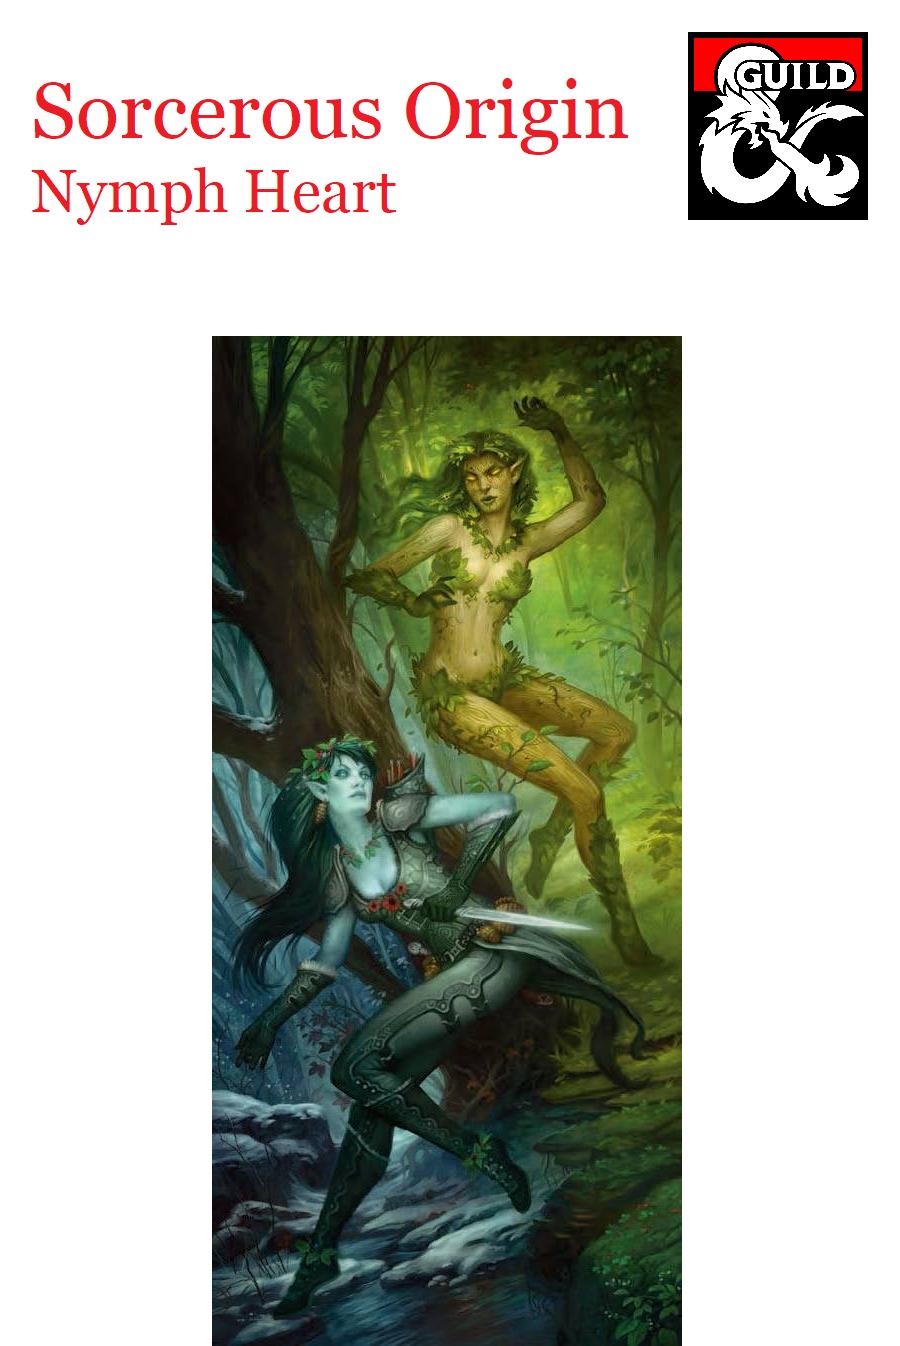 Sorcerous Origin - Nymph Heart (Aura, Dryad, Naiad, Nereid